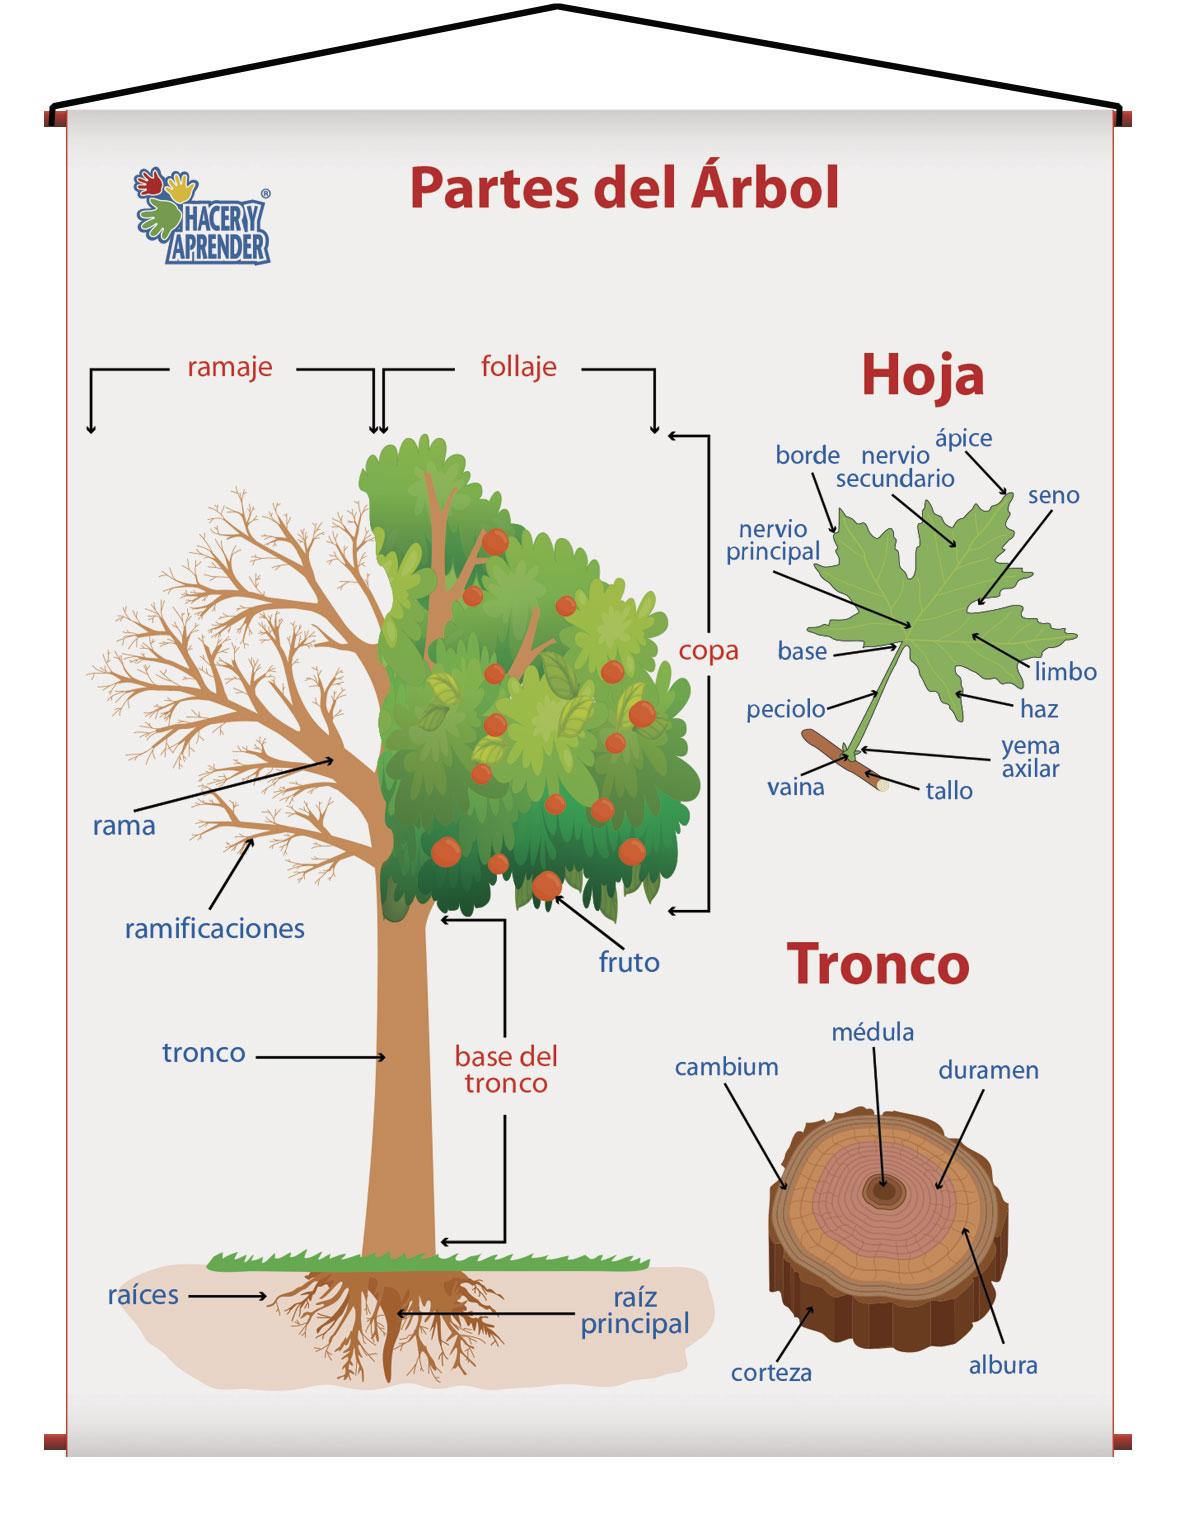 1726 PARTES DEL ARBOL